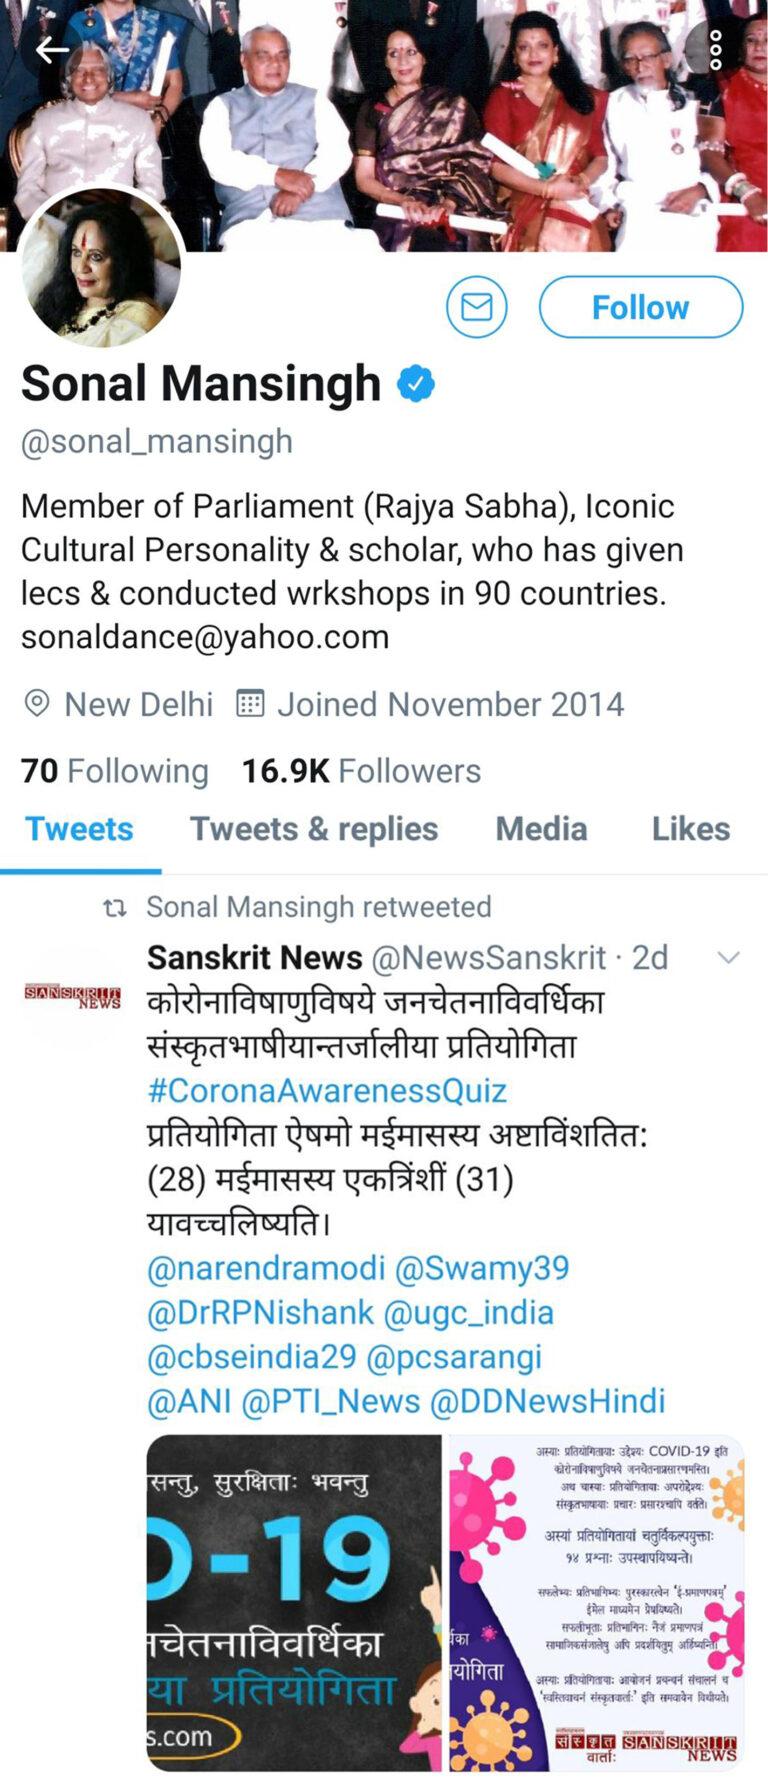 Sonal Mansingh Tweet